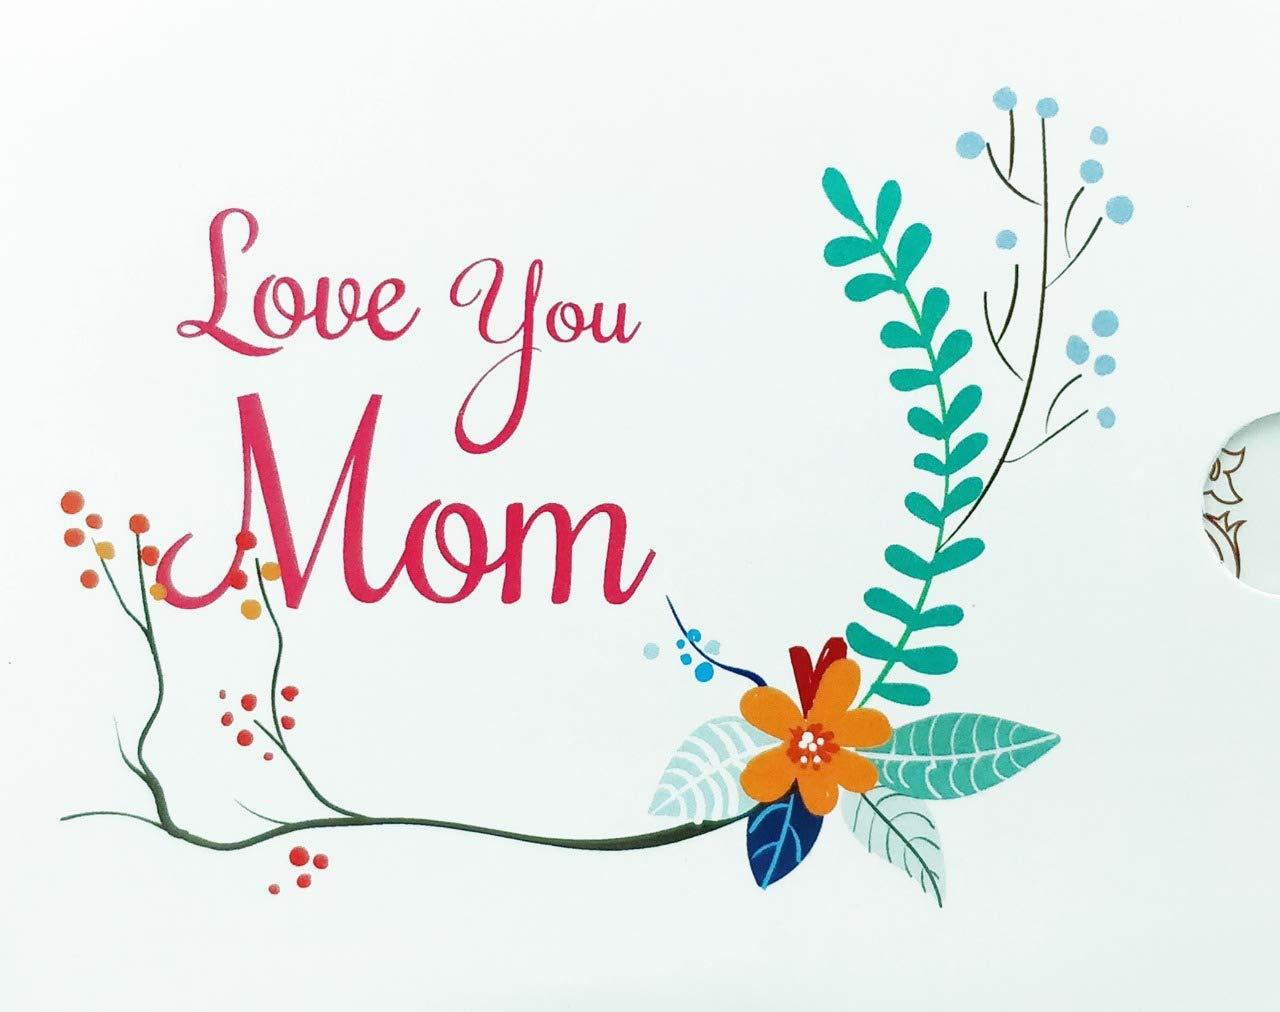 Mom | Sleeve - Love you mom